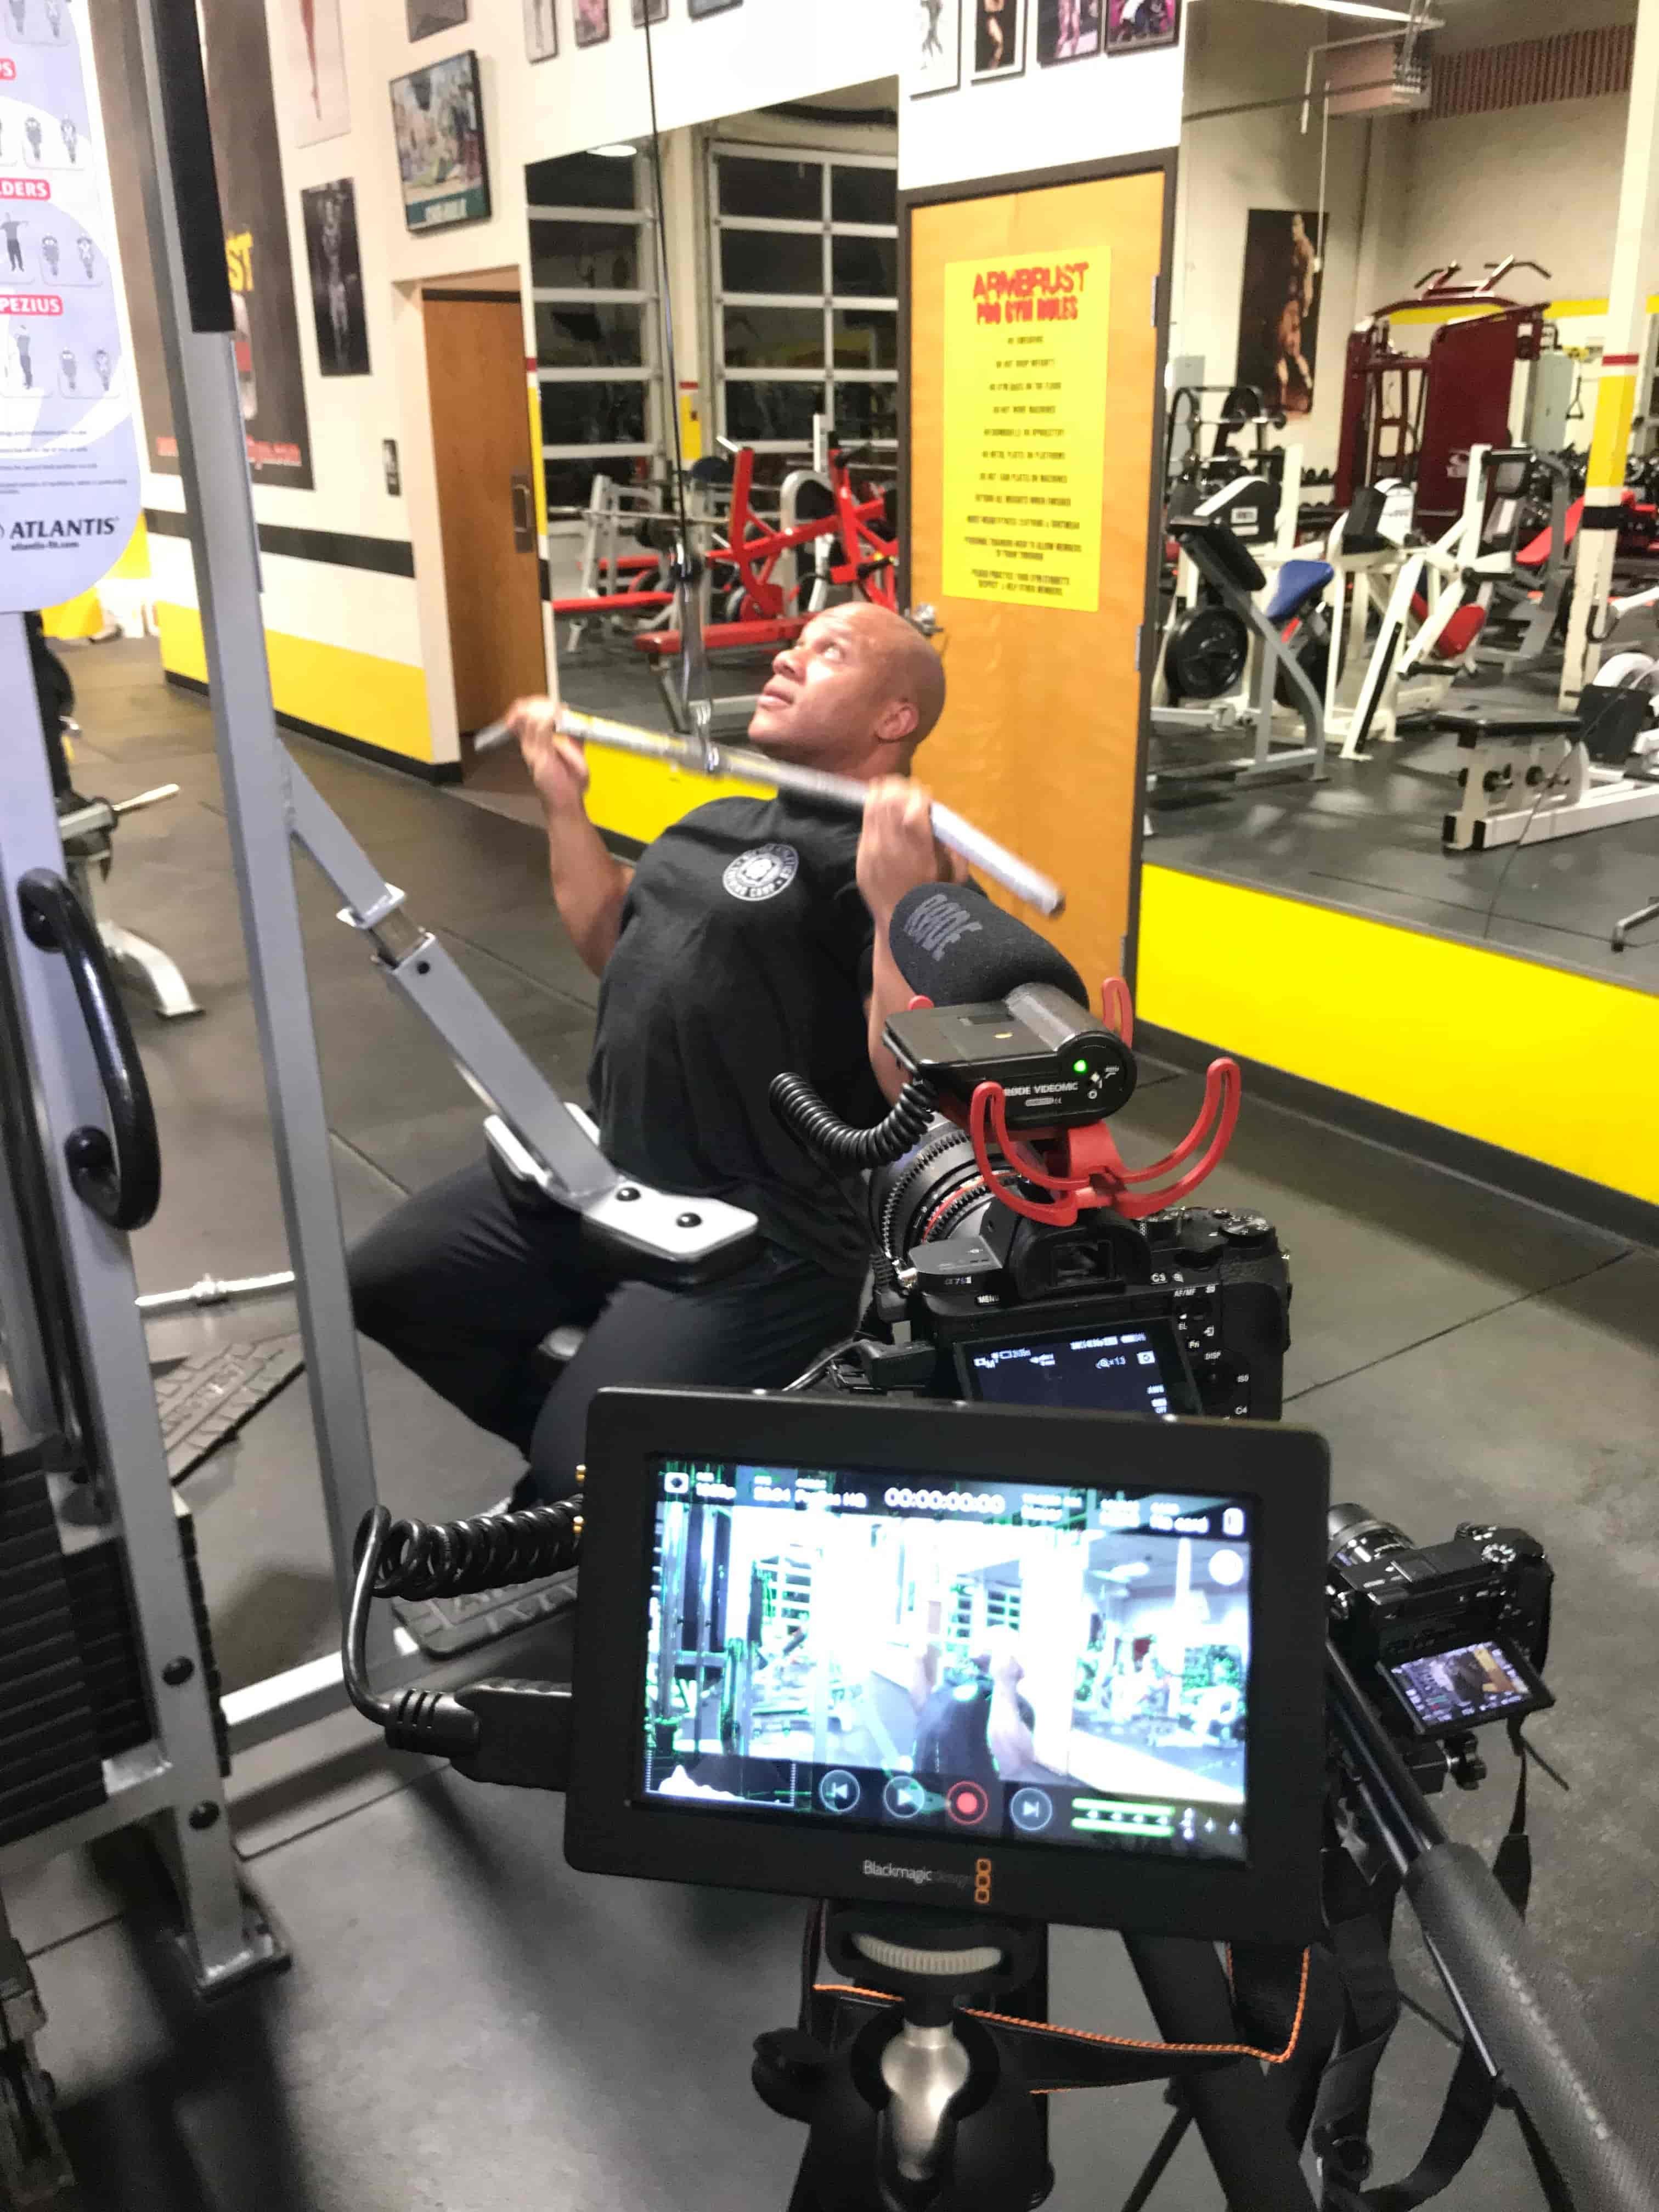 https://0201.nccdn.net/1_2/000/000/0f5/818/FitnessVideoShoot-min-3024x4032.jpg